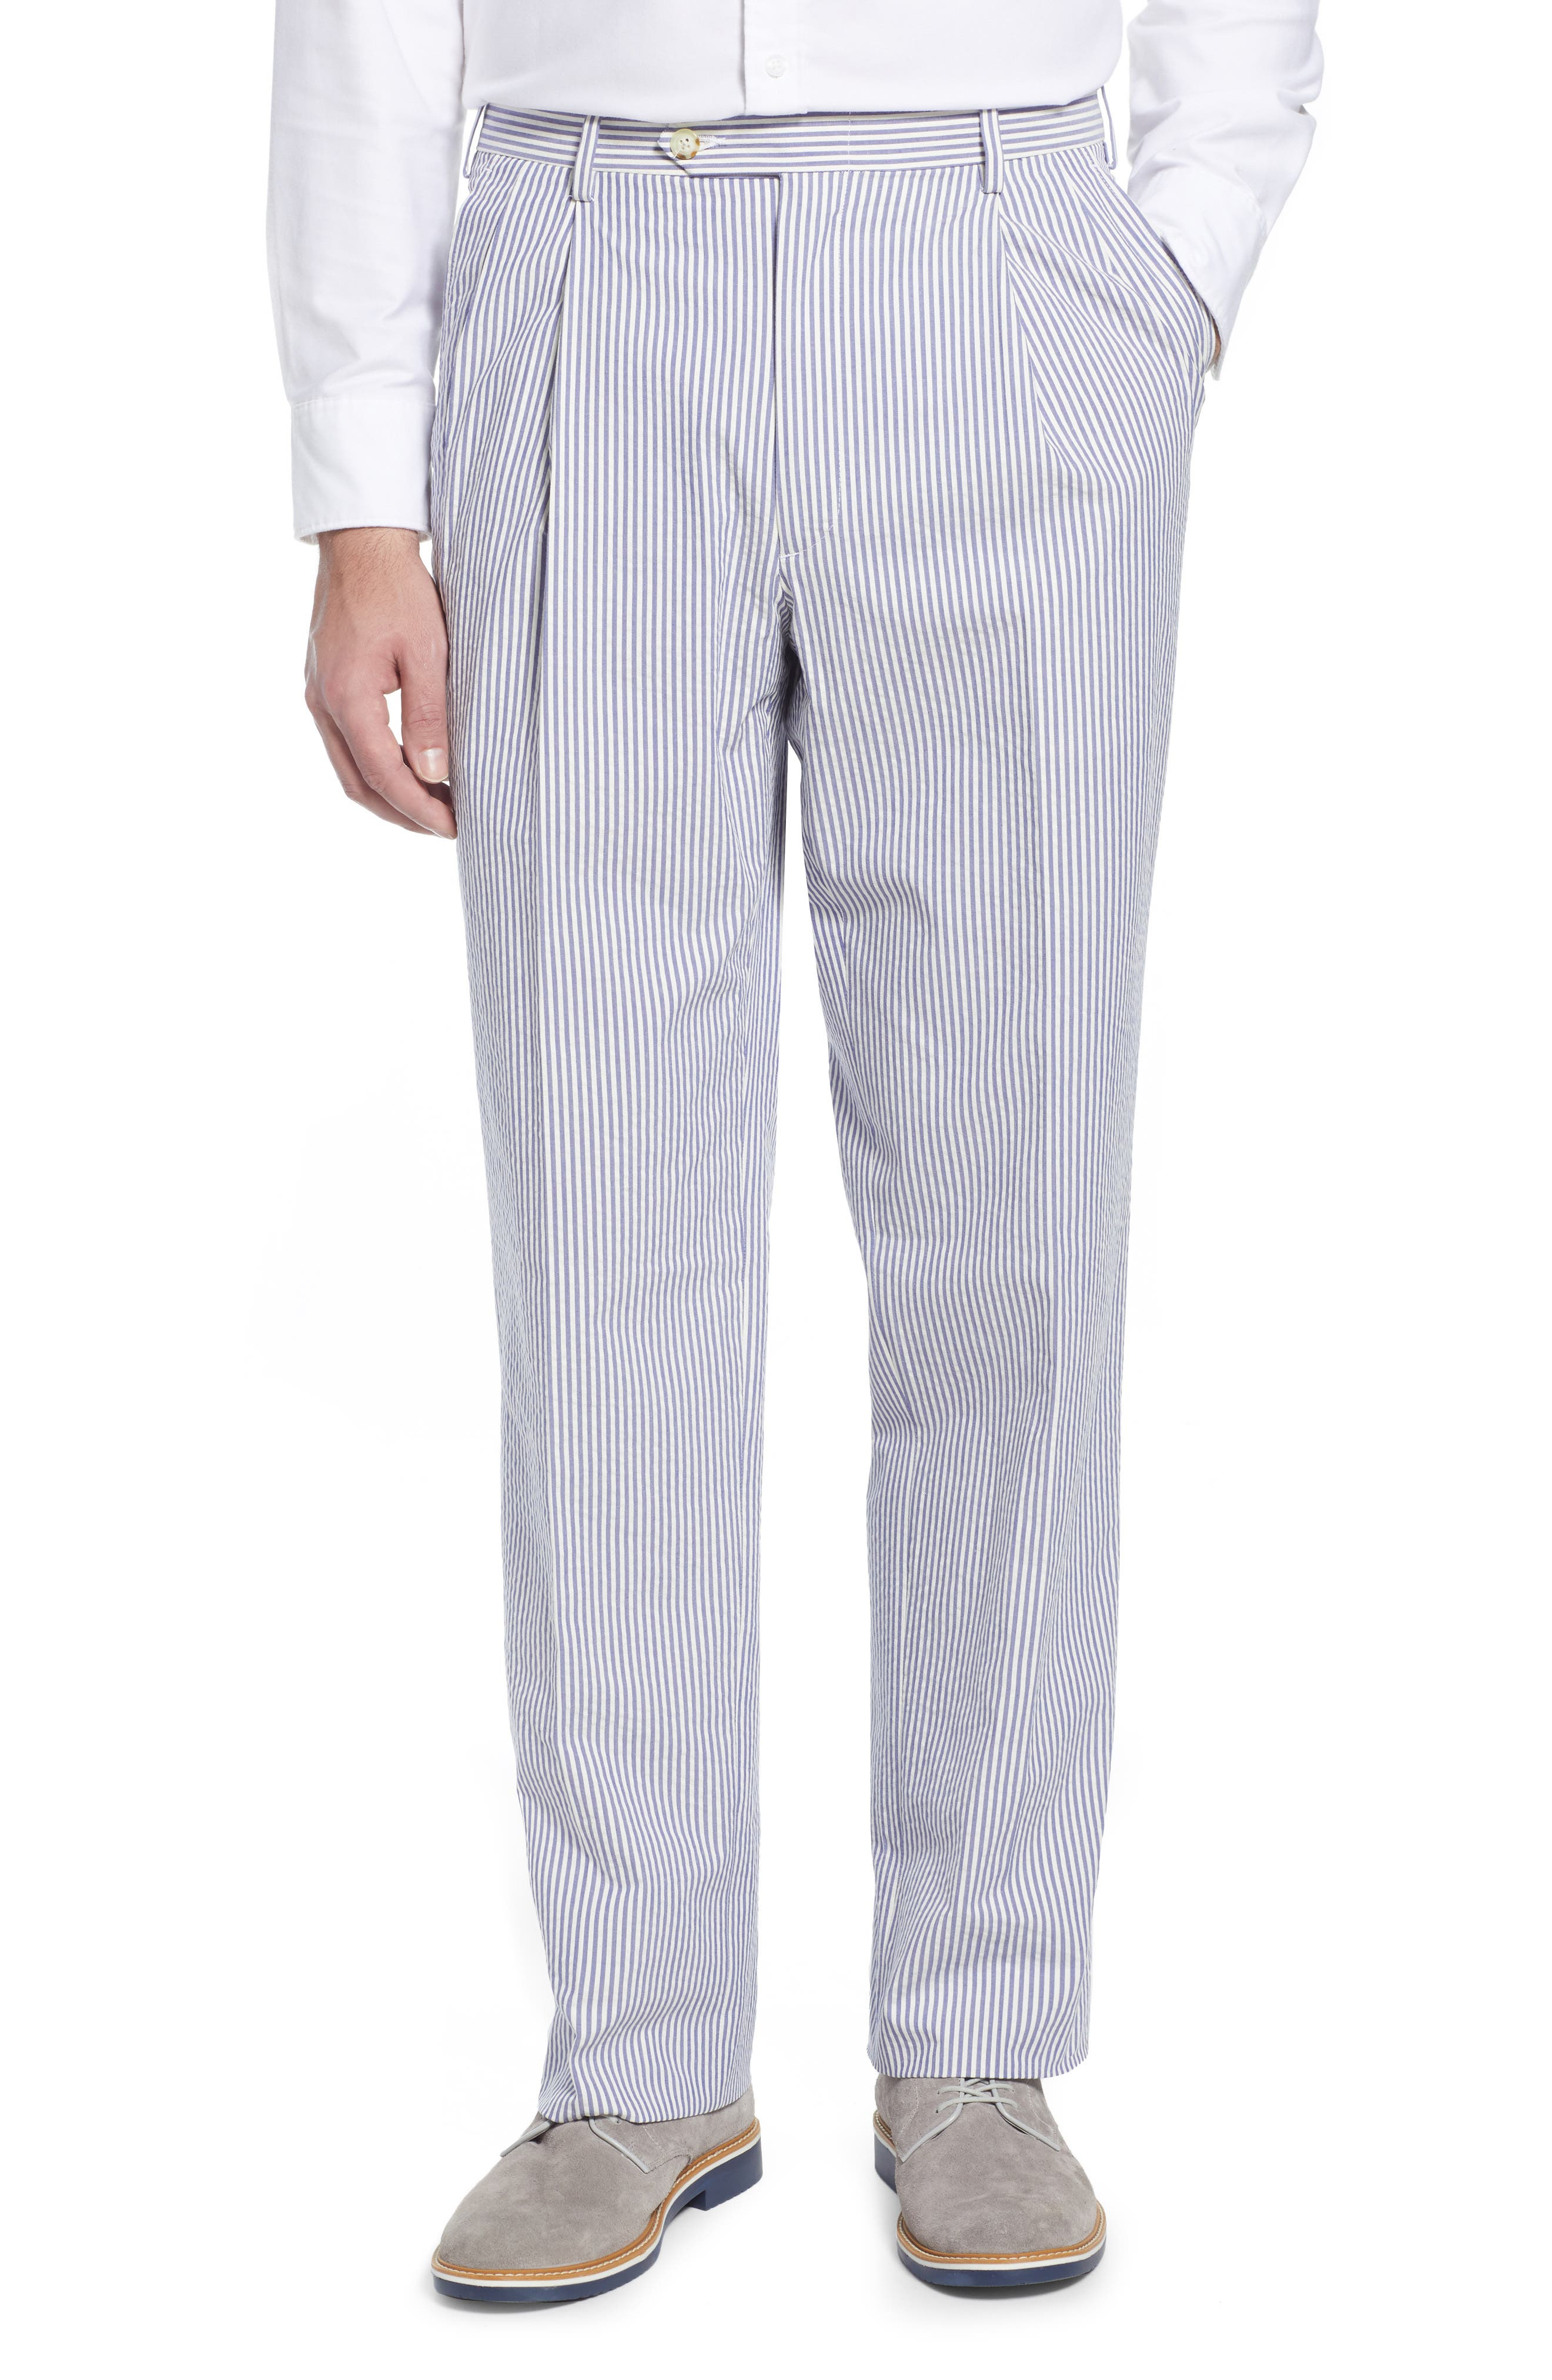 Pleated Seersucker Cotton Dress Pants